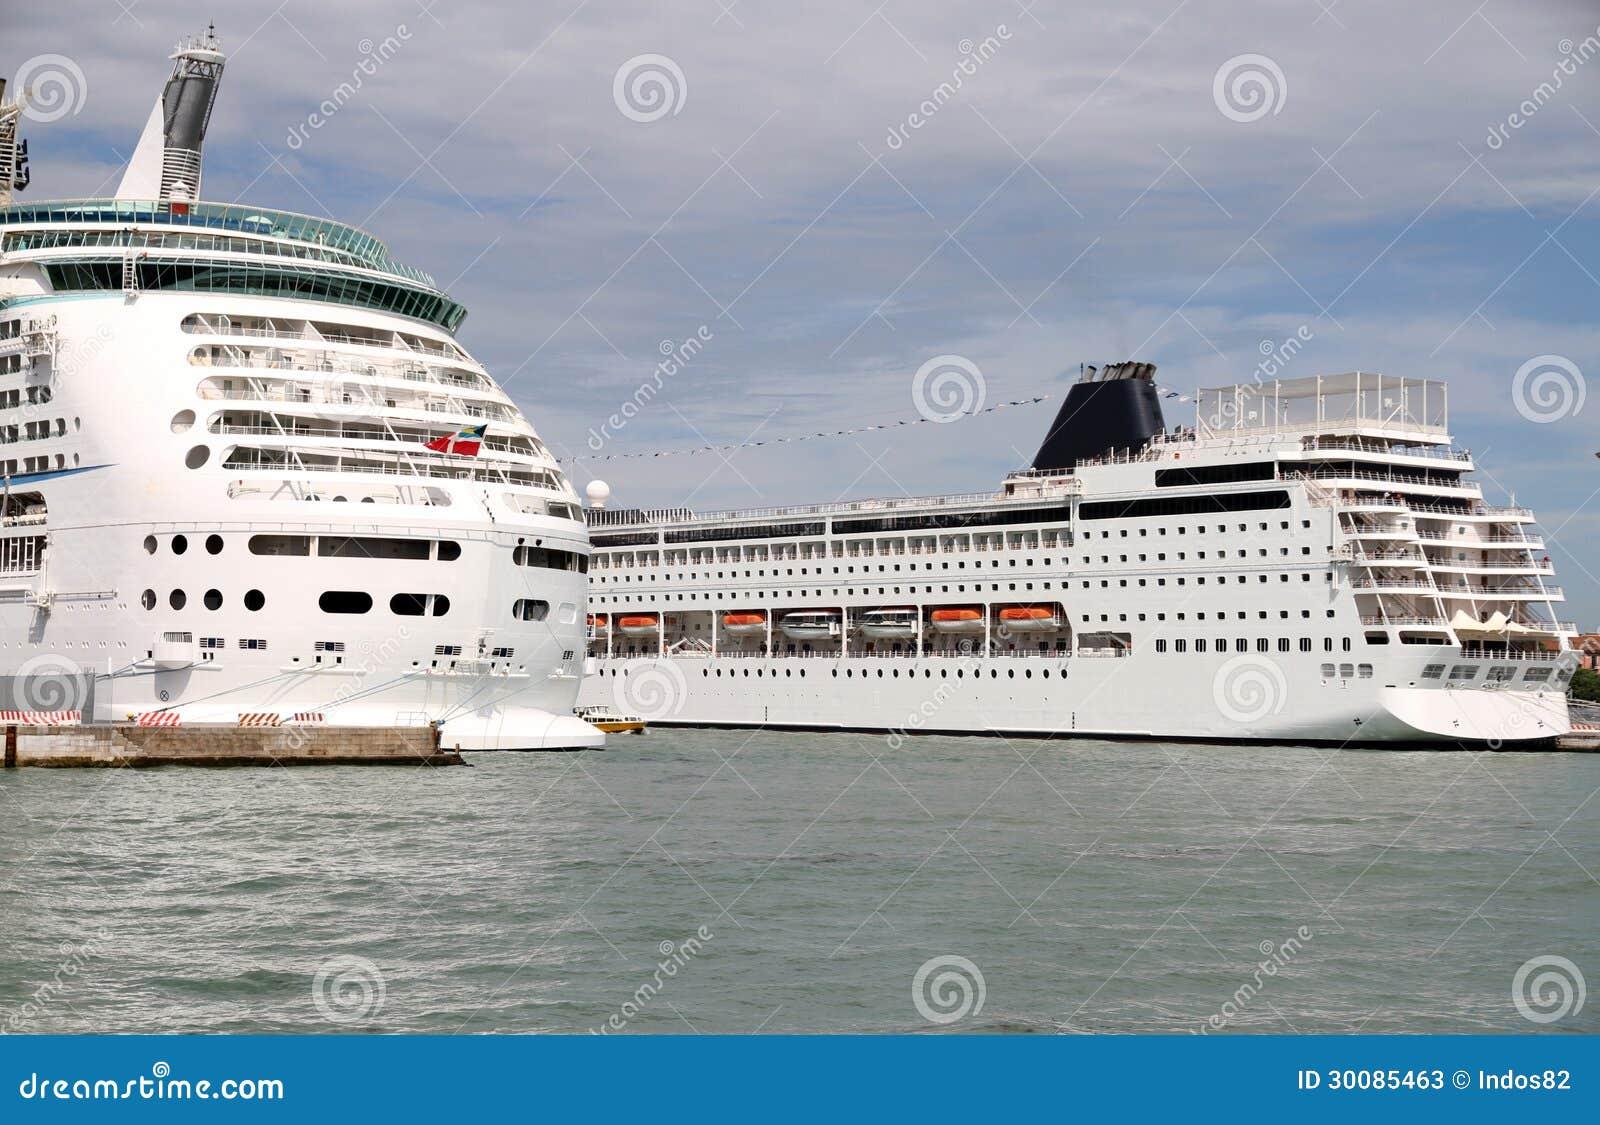 Cruise Ships In Venice Port Stock Photos  Image 30085463